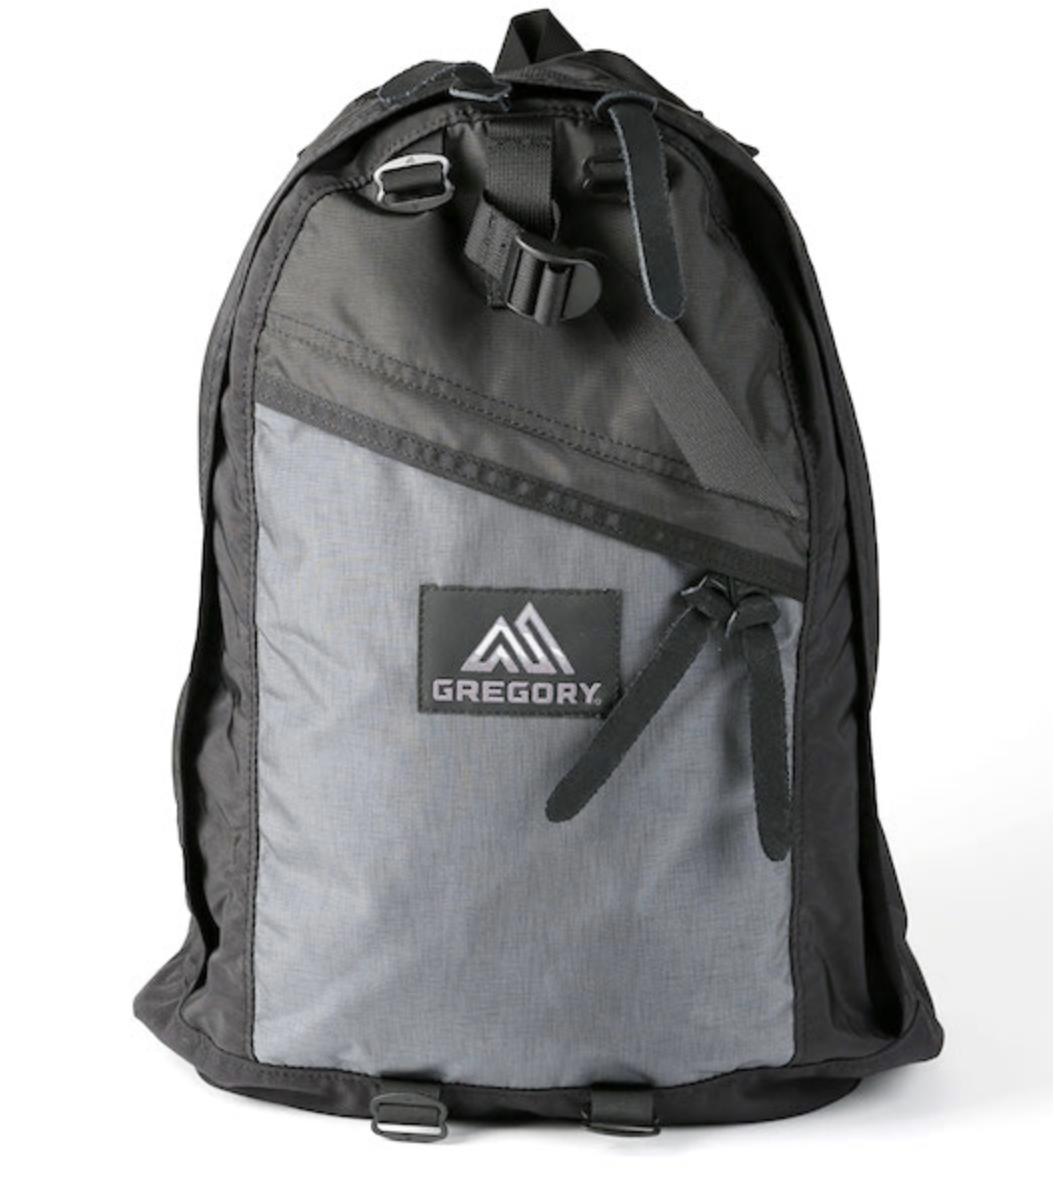 f:id:thebackpack:20190913111142p:plain